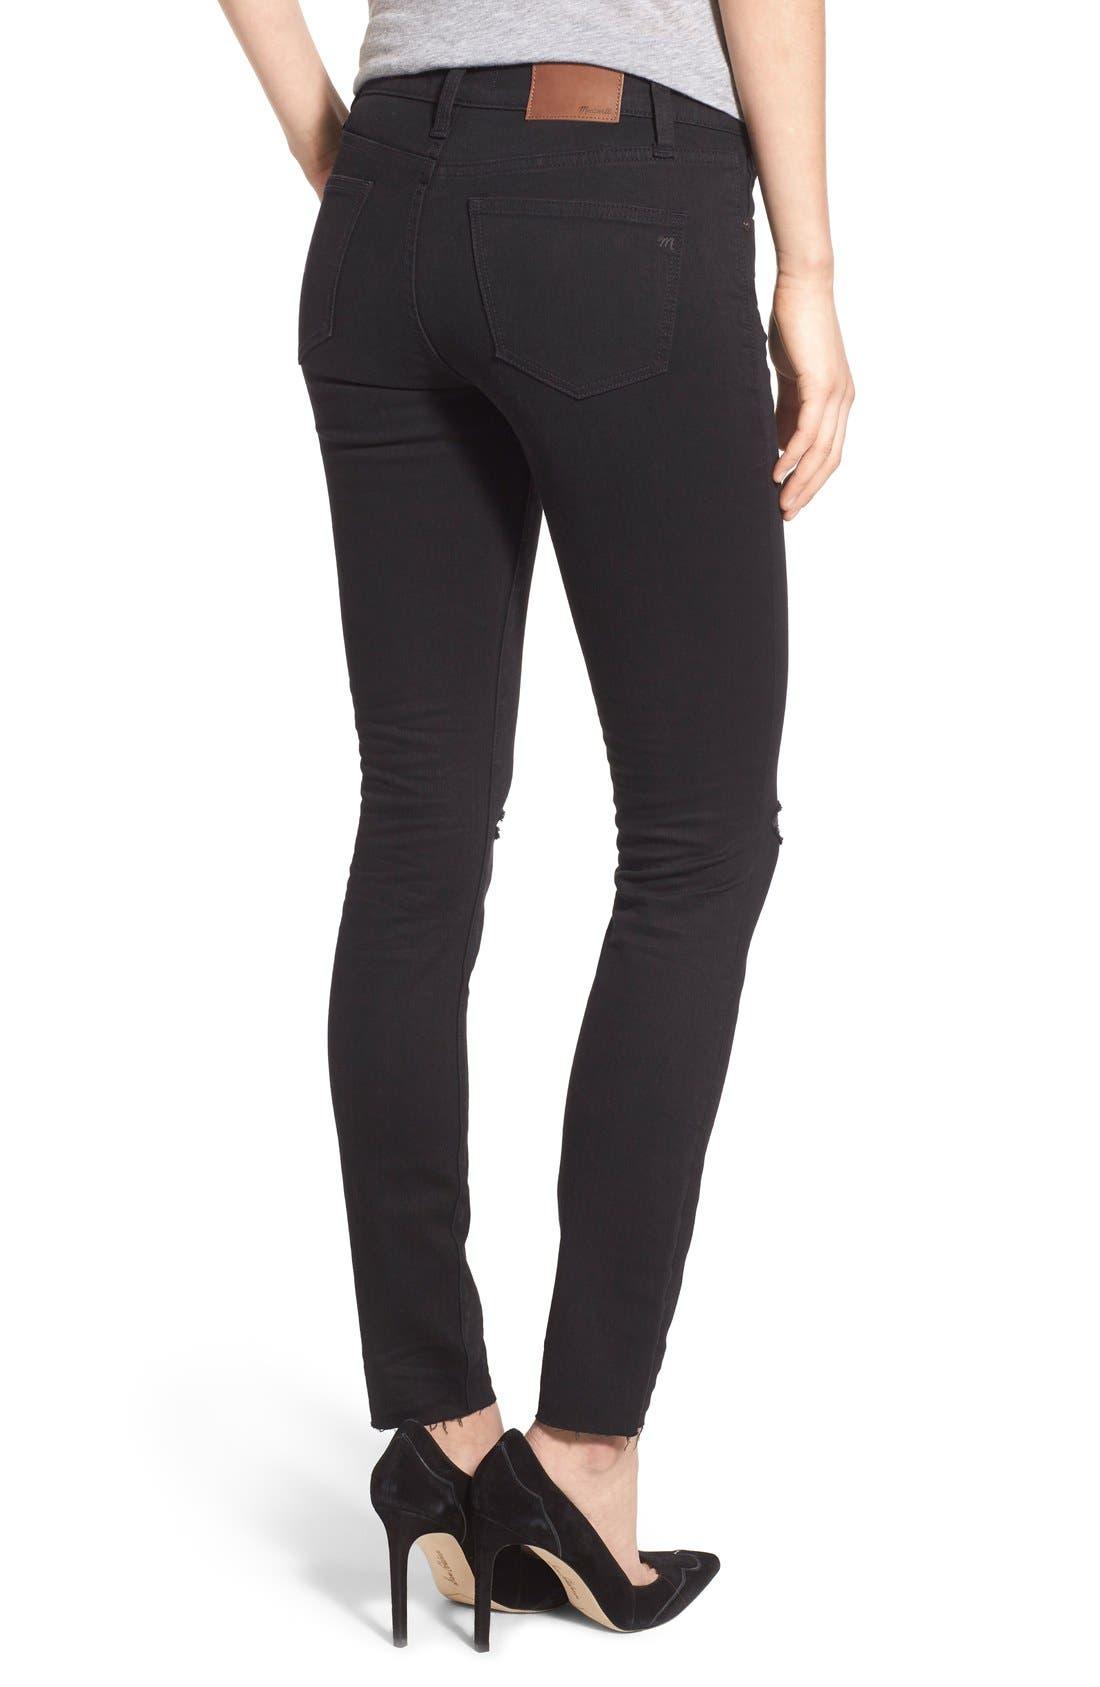 Alternate Image 2  - Madewell 'Skinny Skinny' Knee Rip Jeans (Trent Wash) (Long)